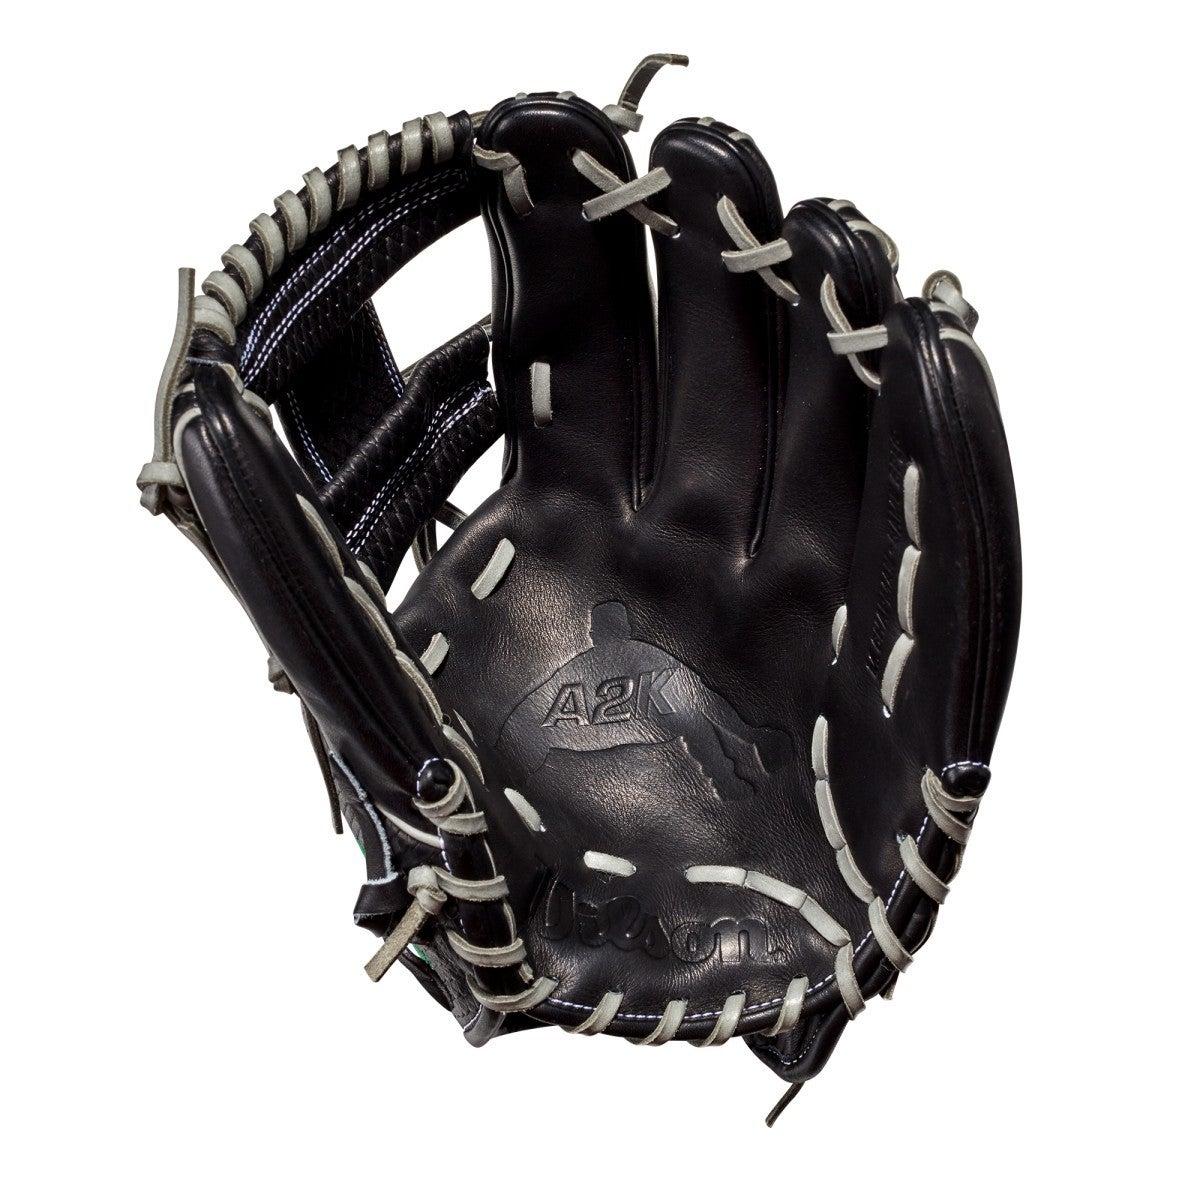 Matt Chapman's glove with palm stamp